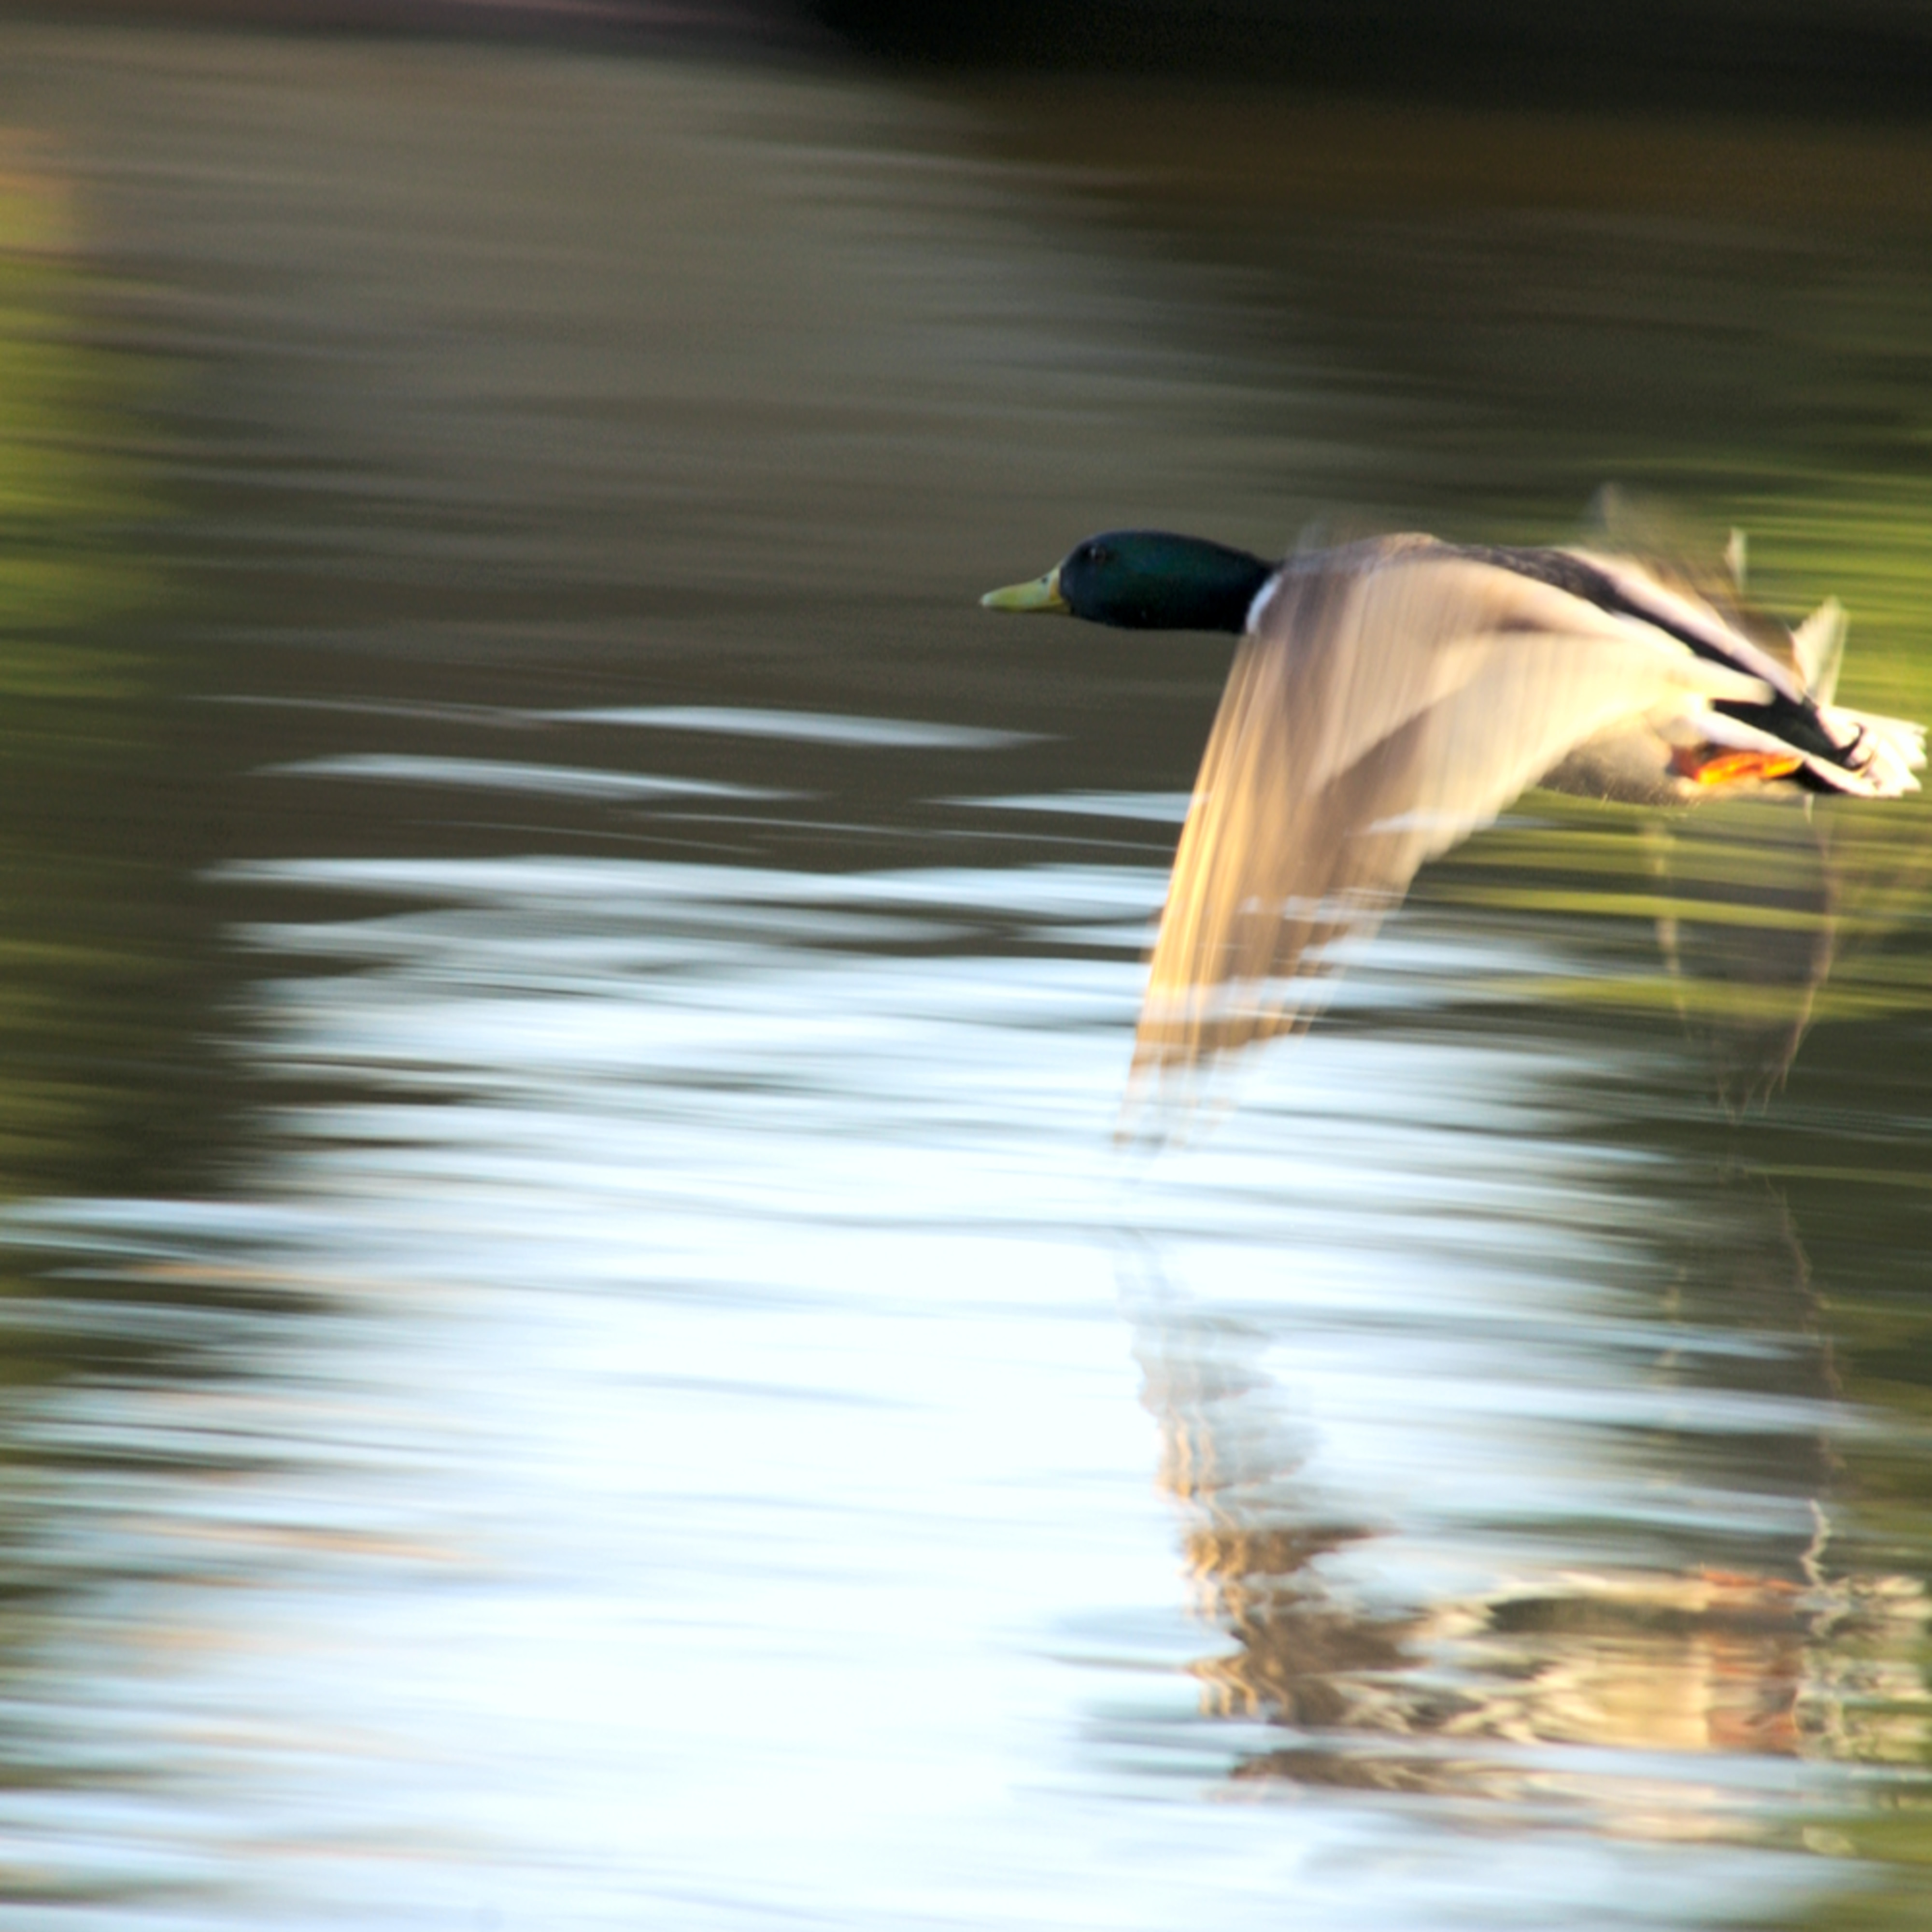 Taking flight gvbcvj